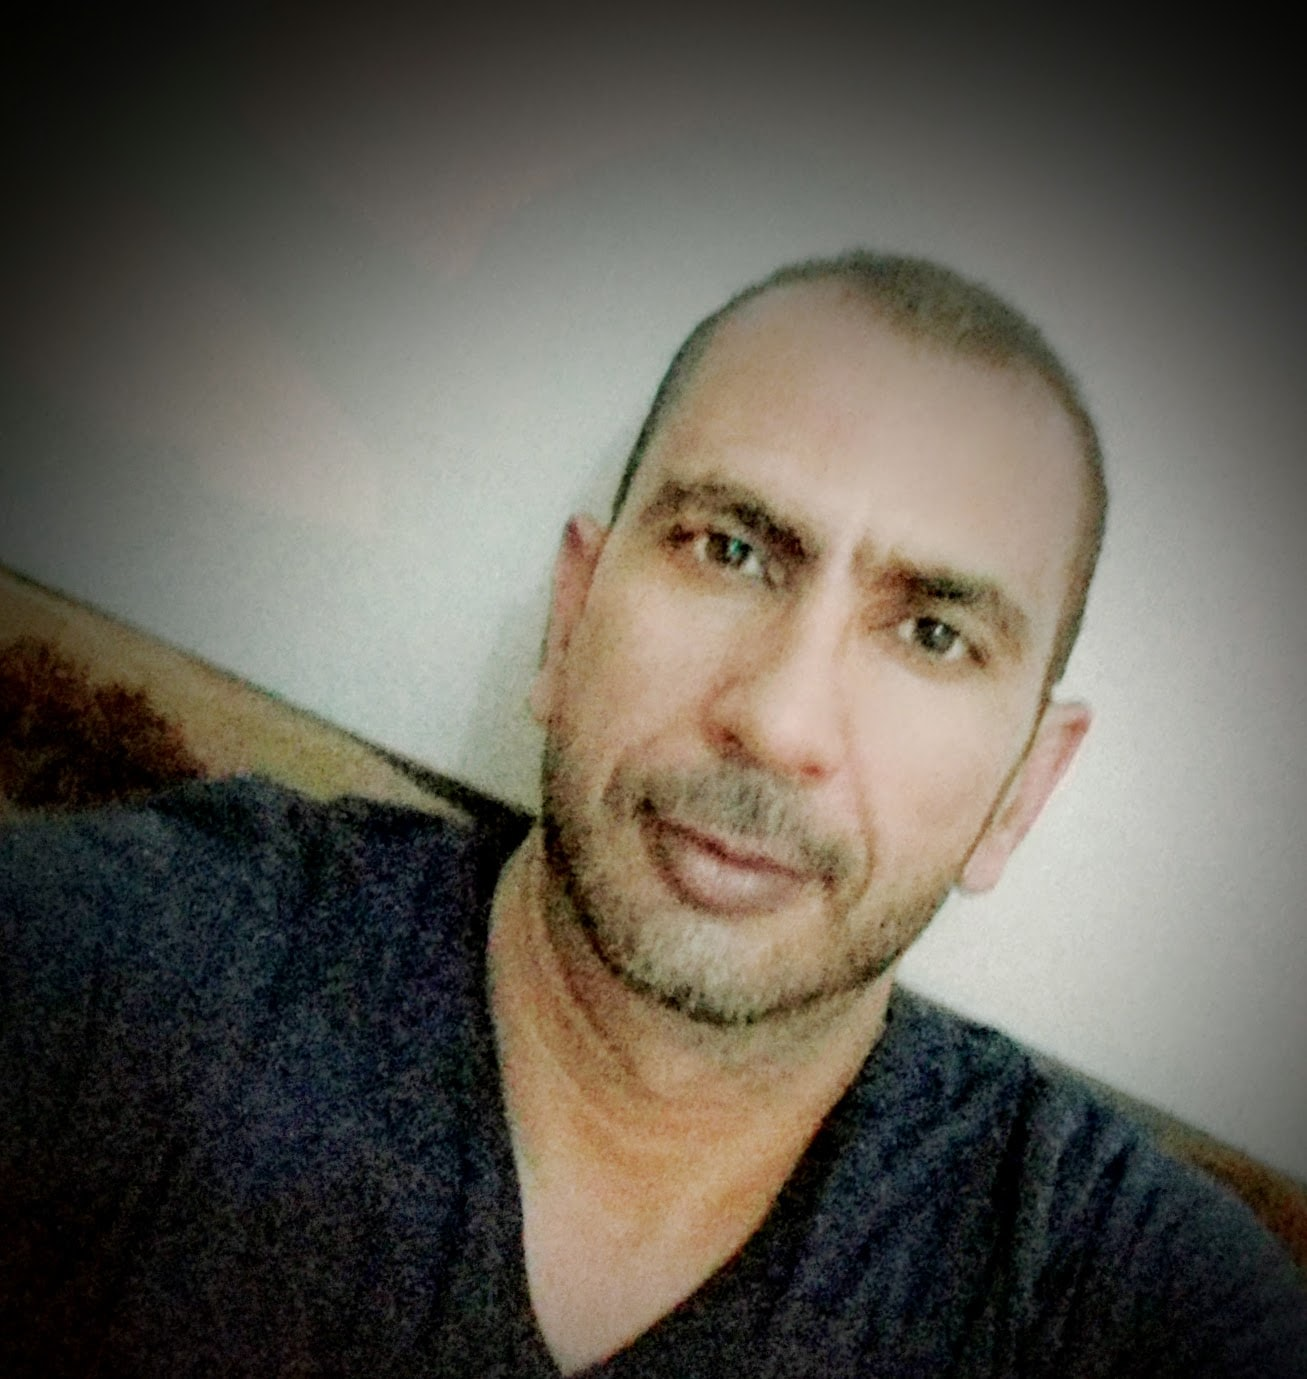 Go to Tarik Zekraoui's profile